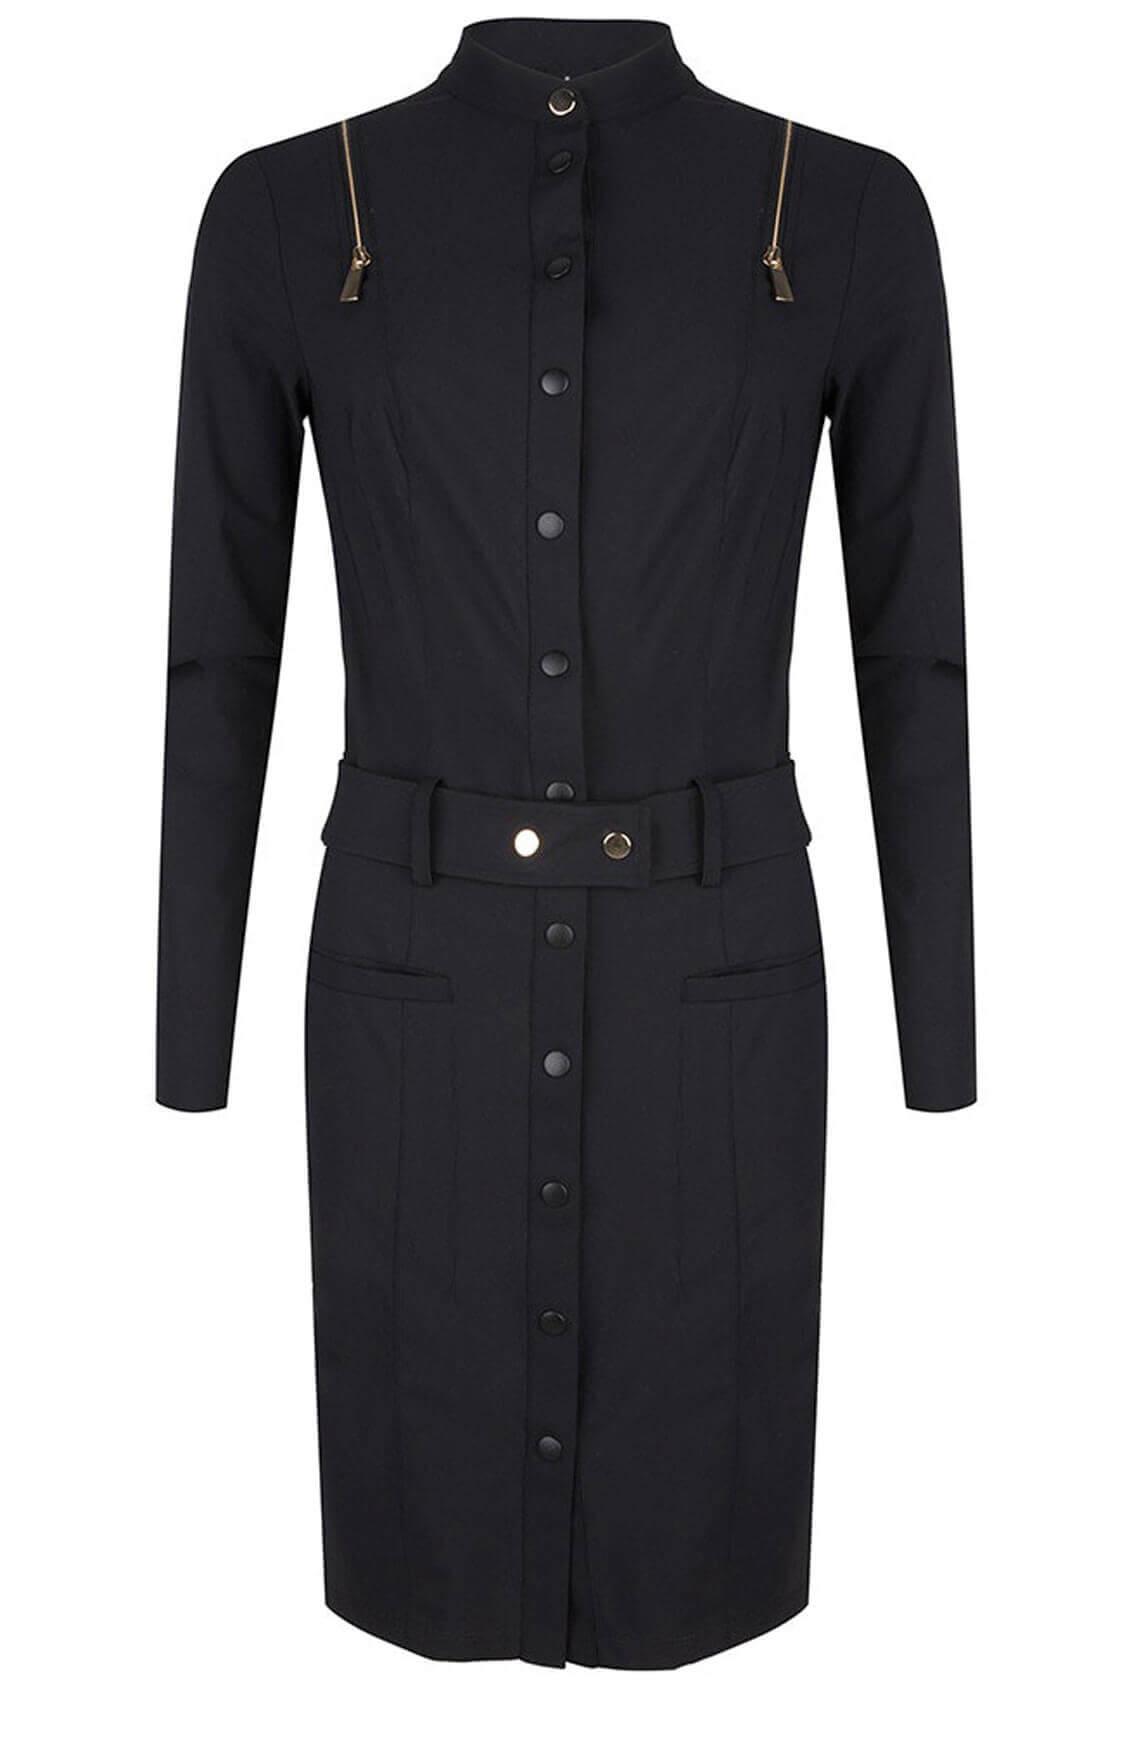 Jane Lushka Dames Jersey jurk met gouden details zwart